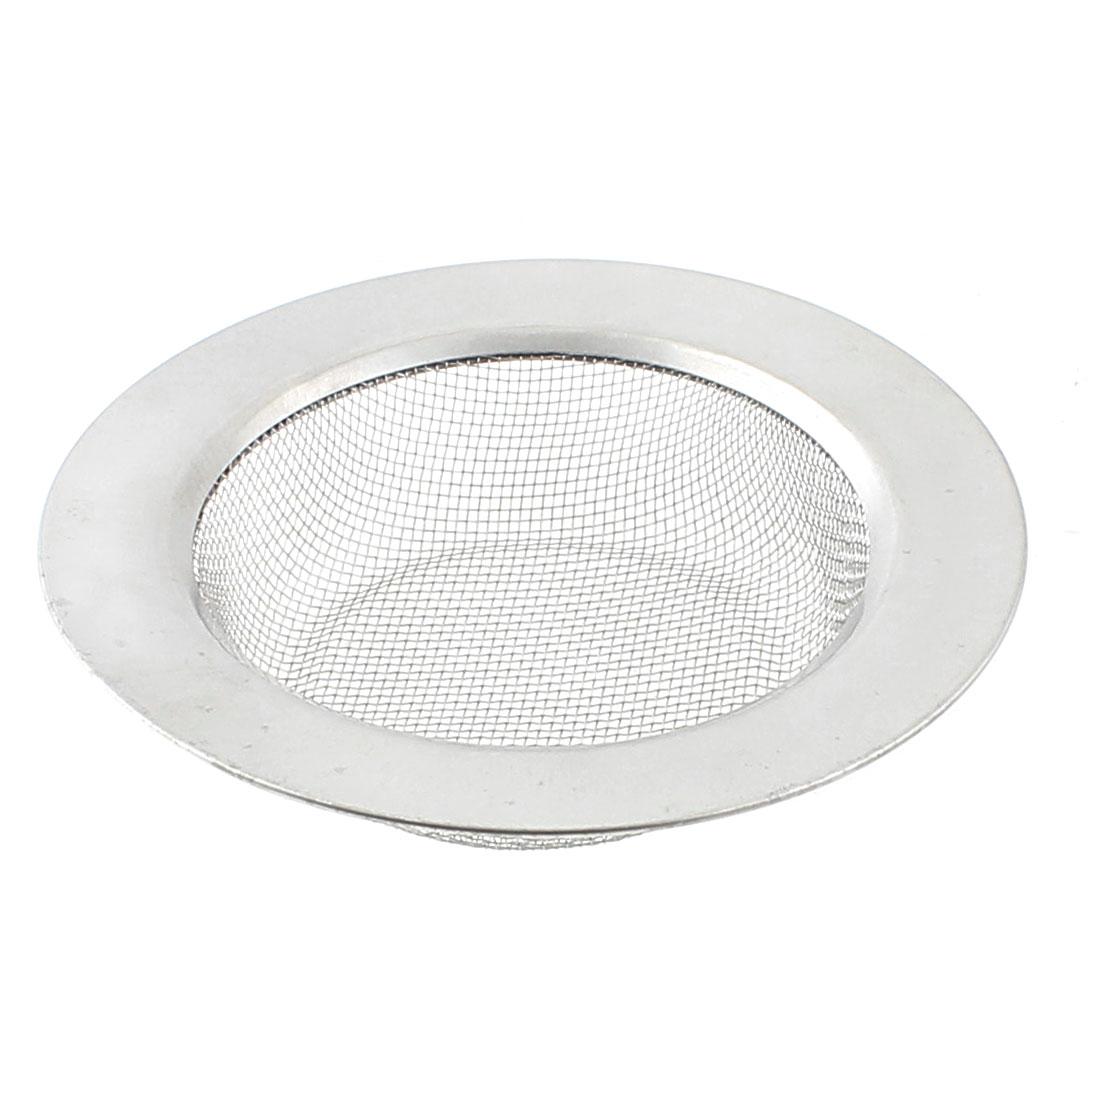 113mm Dia Home Kitchen Sink Basin Drain Waste Filter Strainer Basket Silver Tone